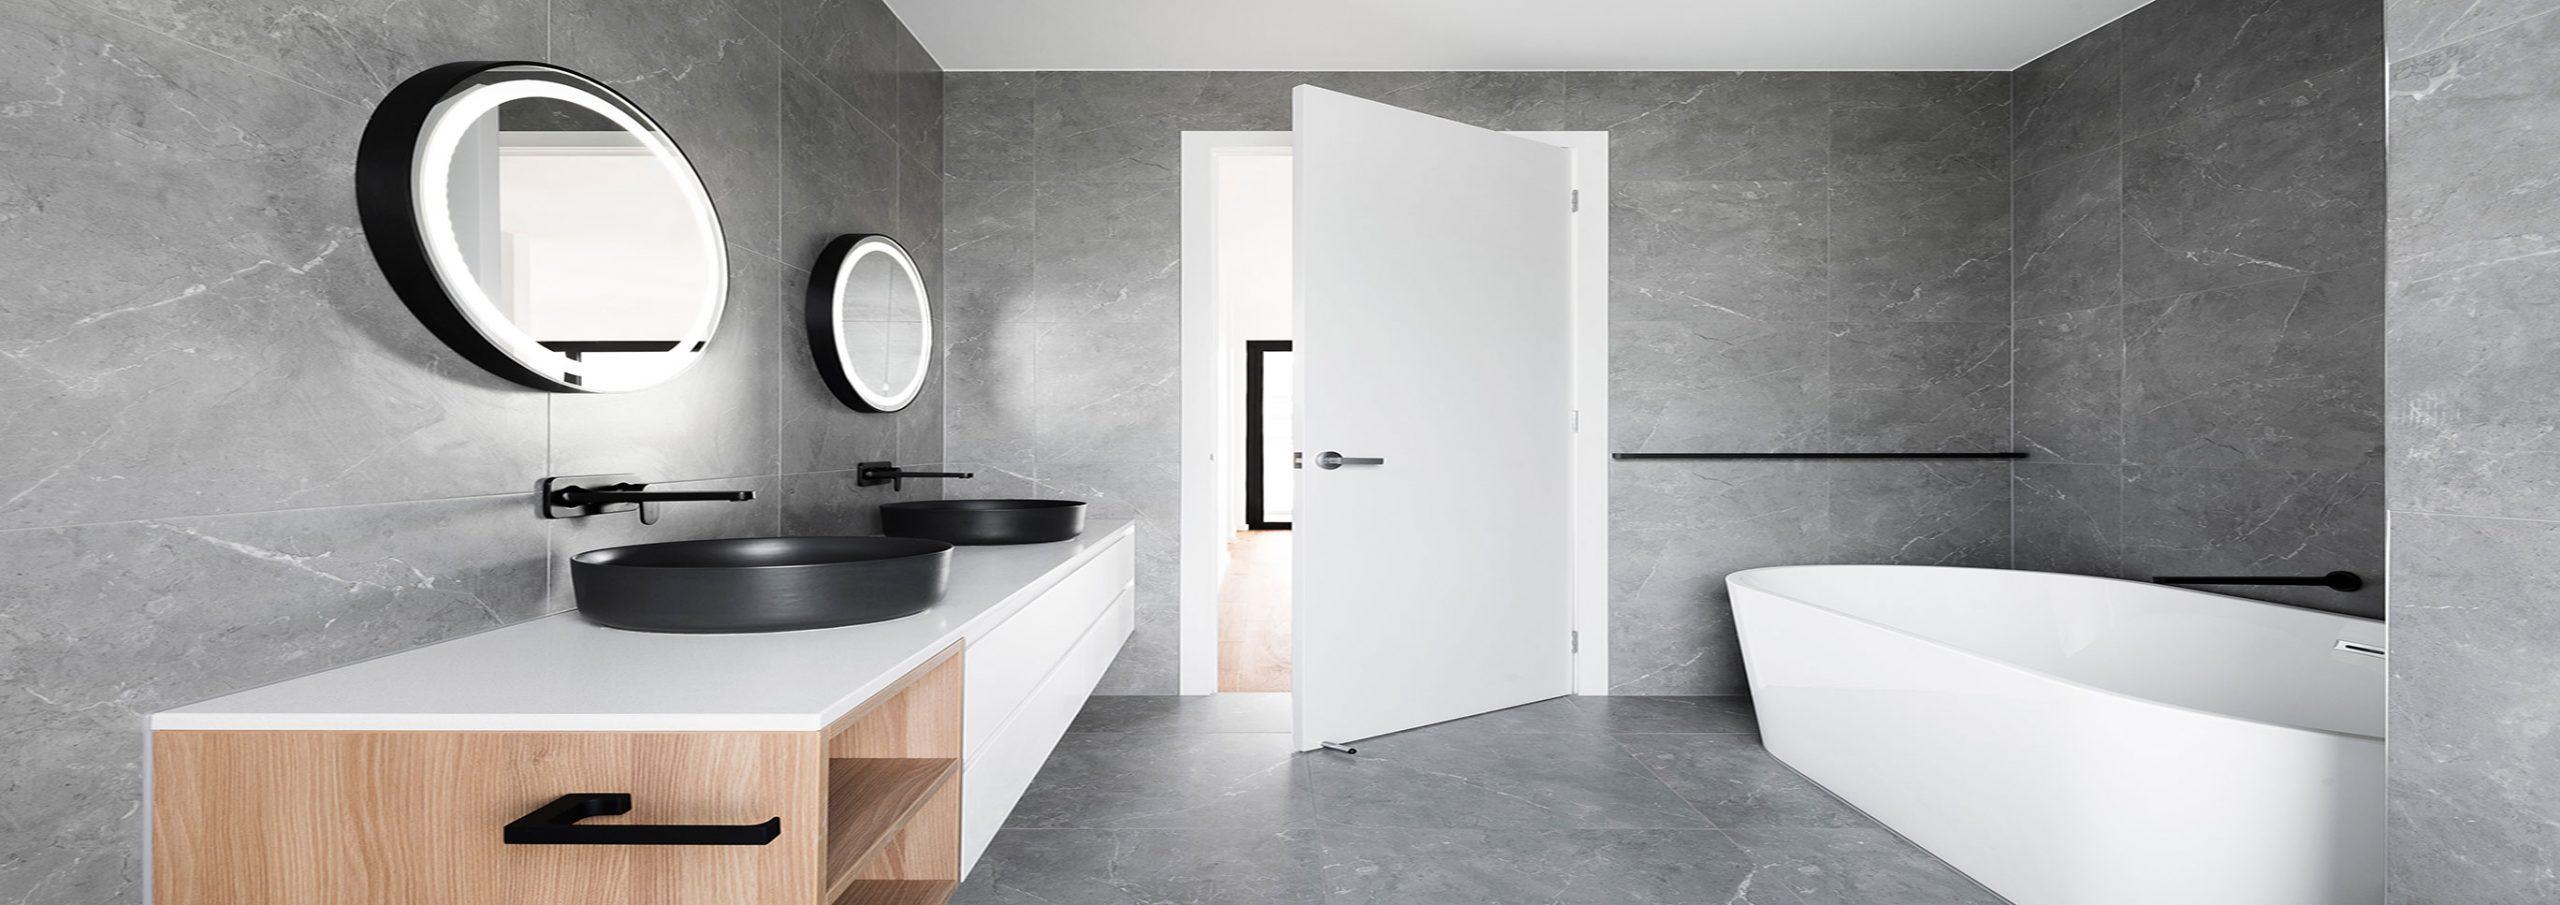 3 Lampenmodelle fürs Badezimmer